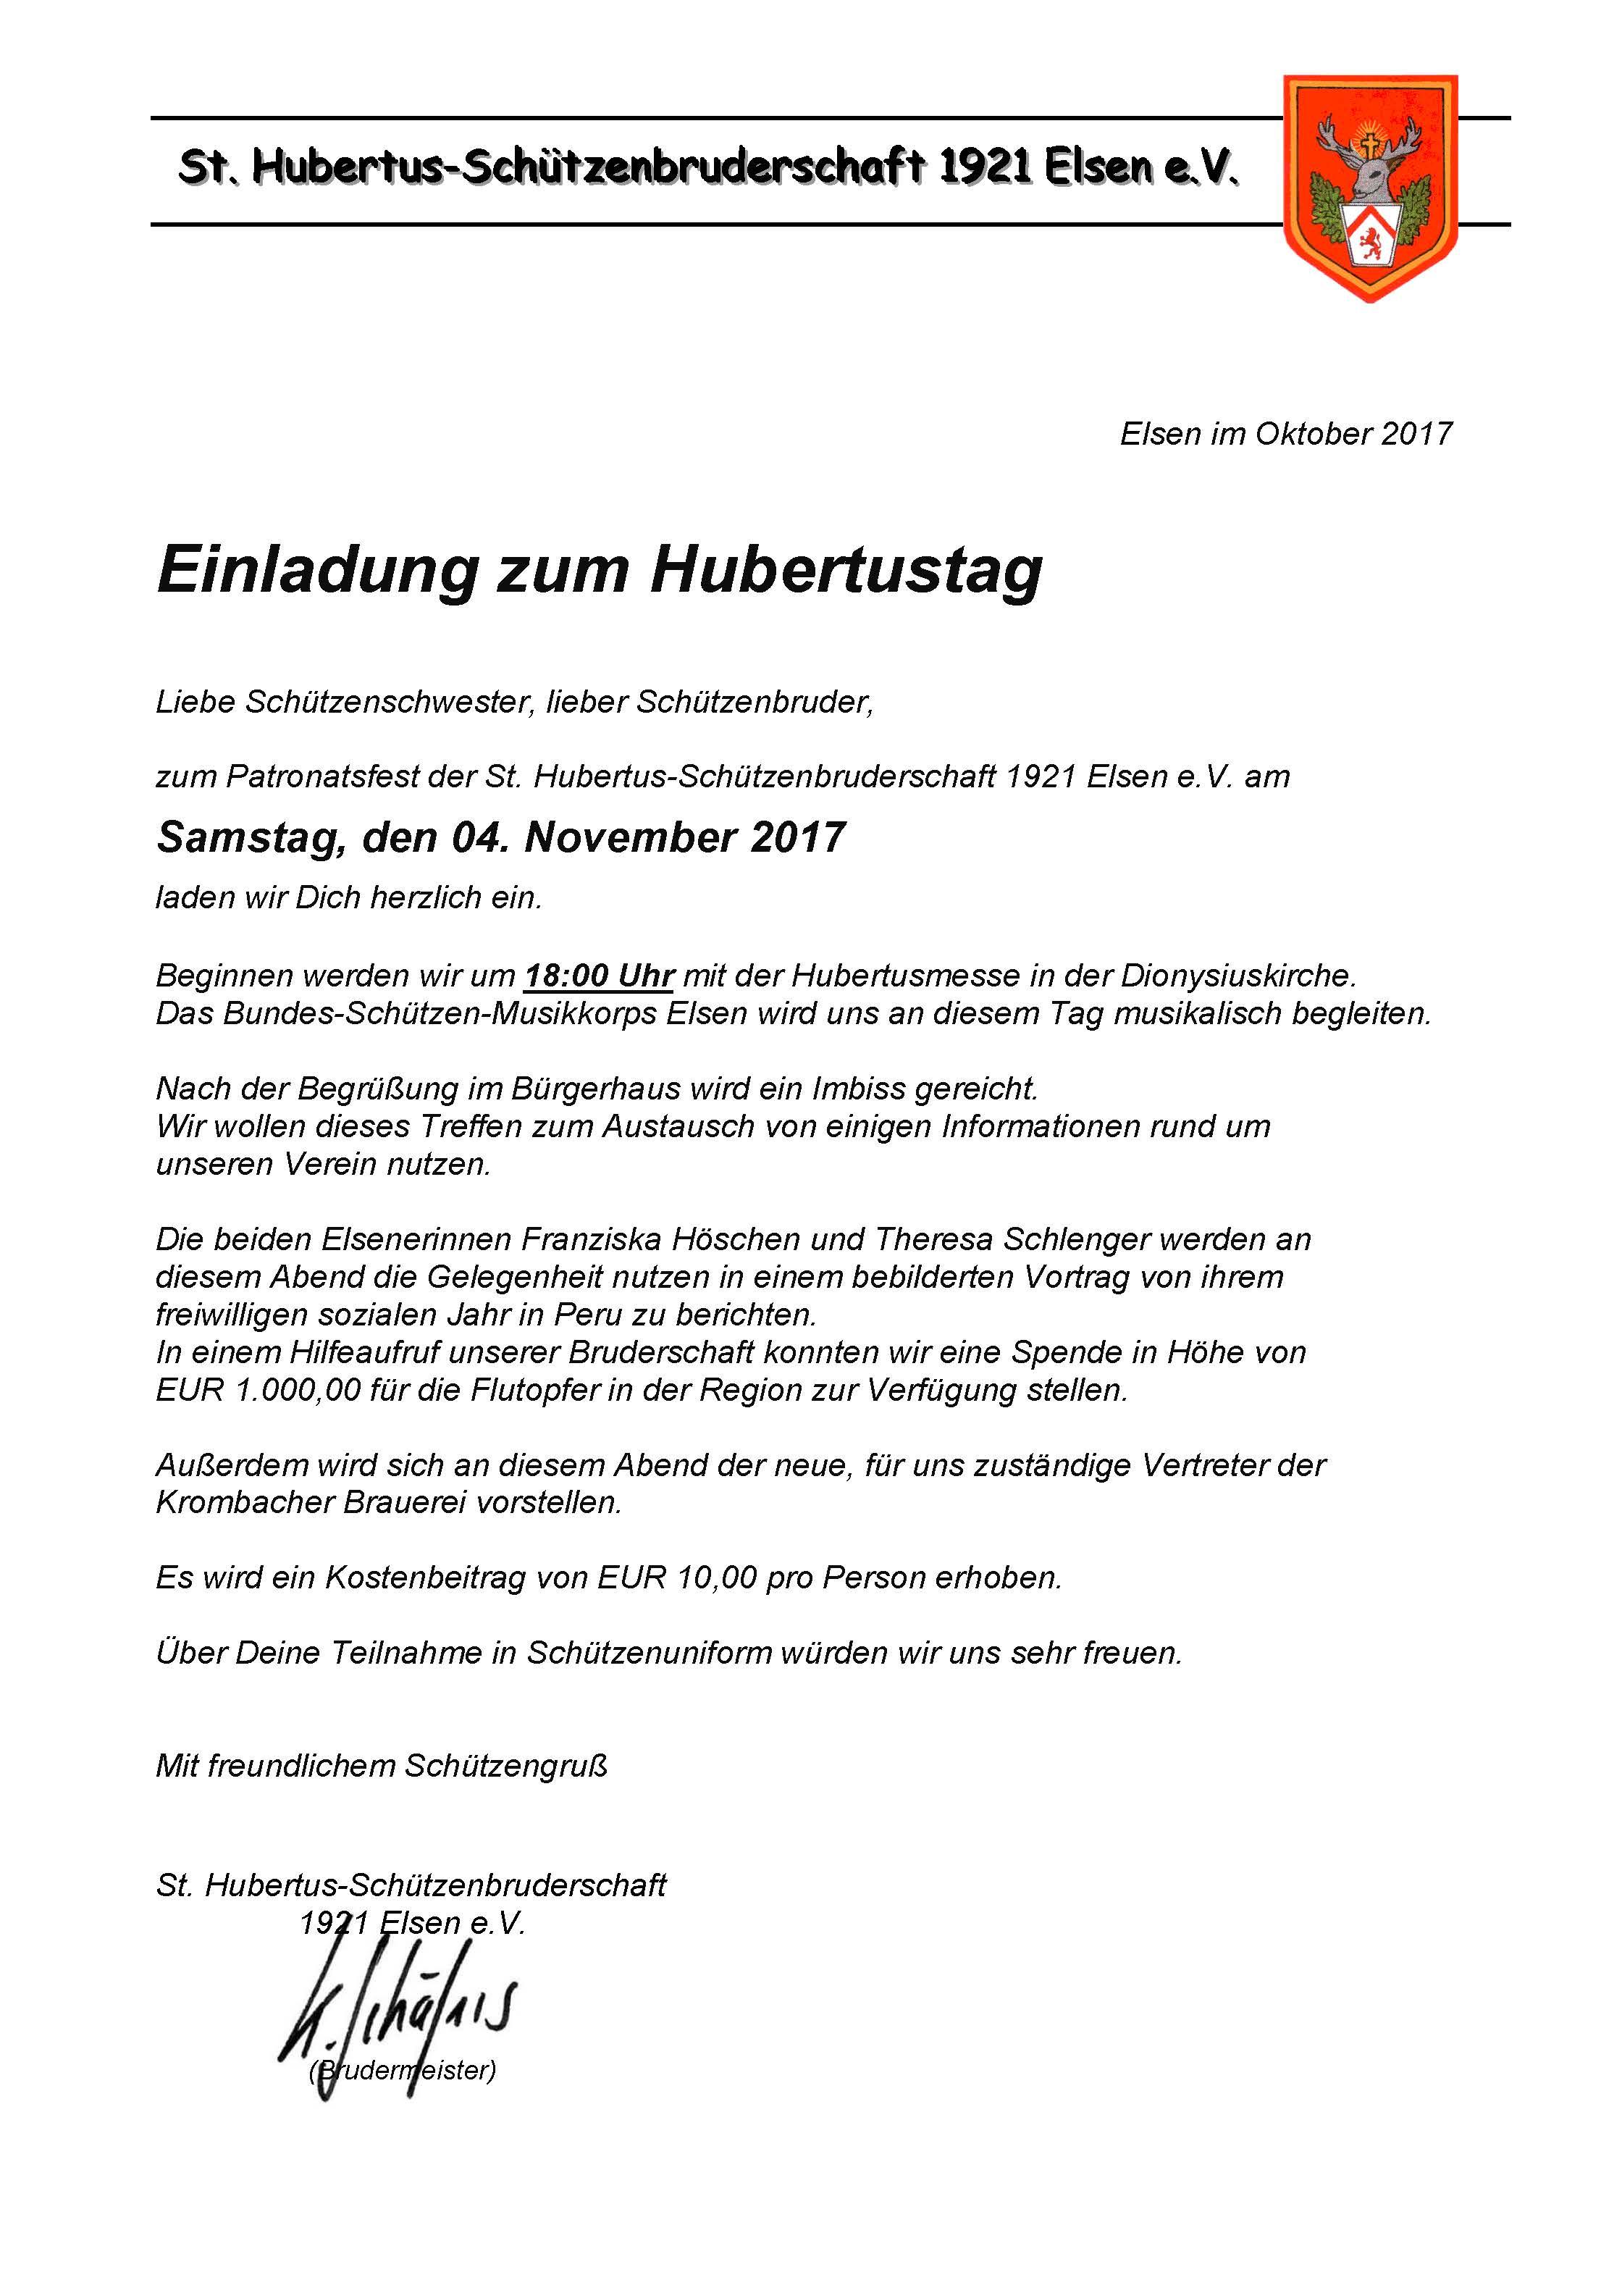 Einladung Hubertustag_2017